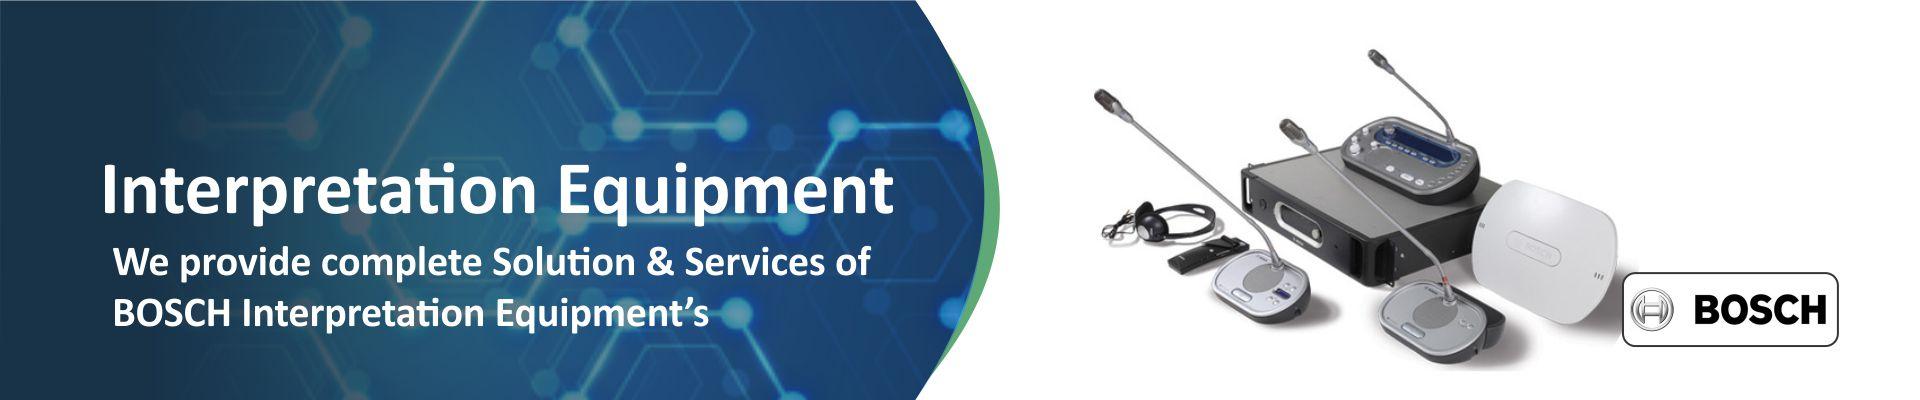 Bosch Interpretation Equipment and Services